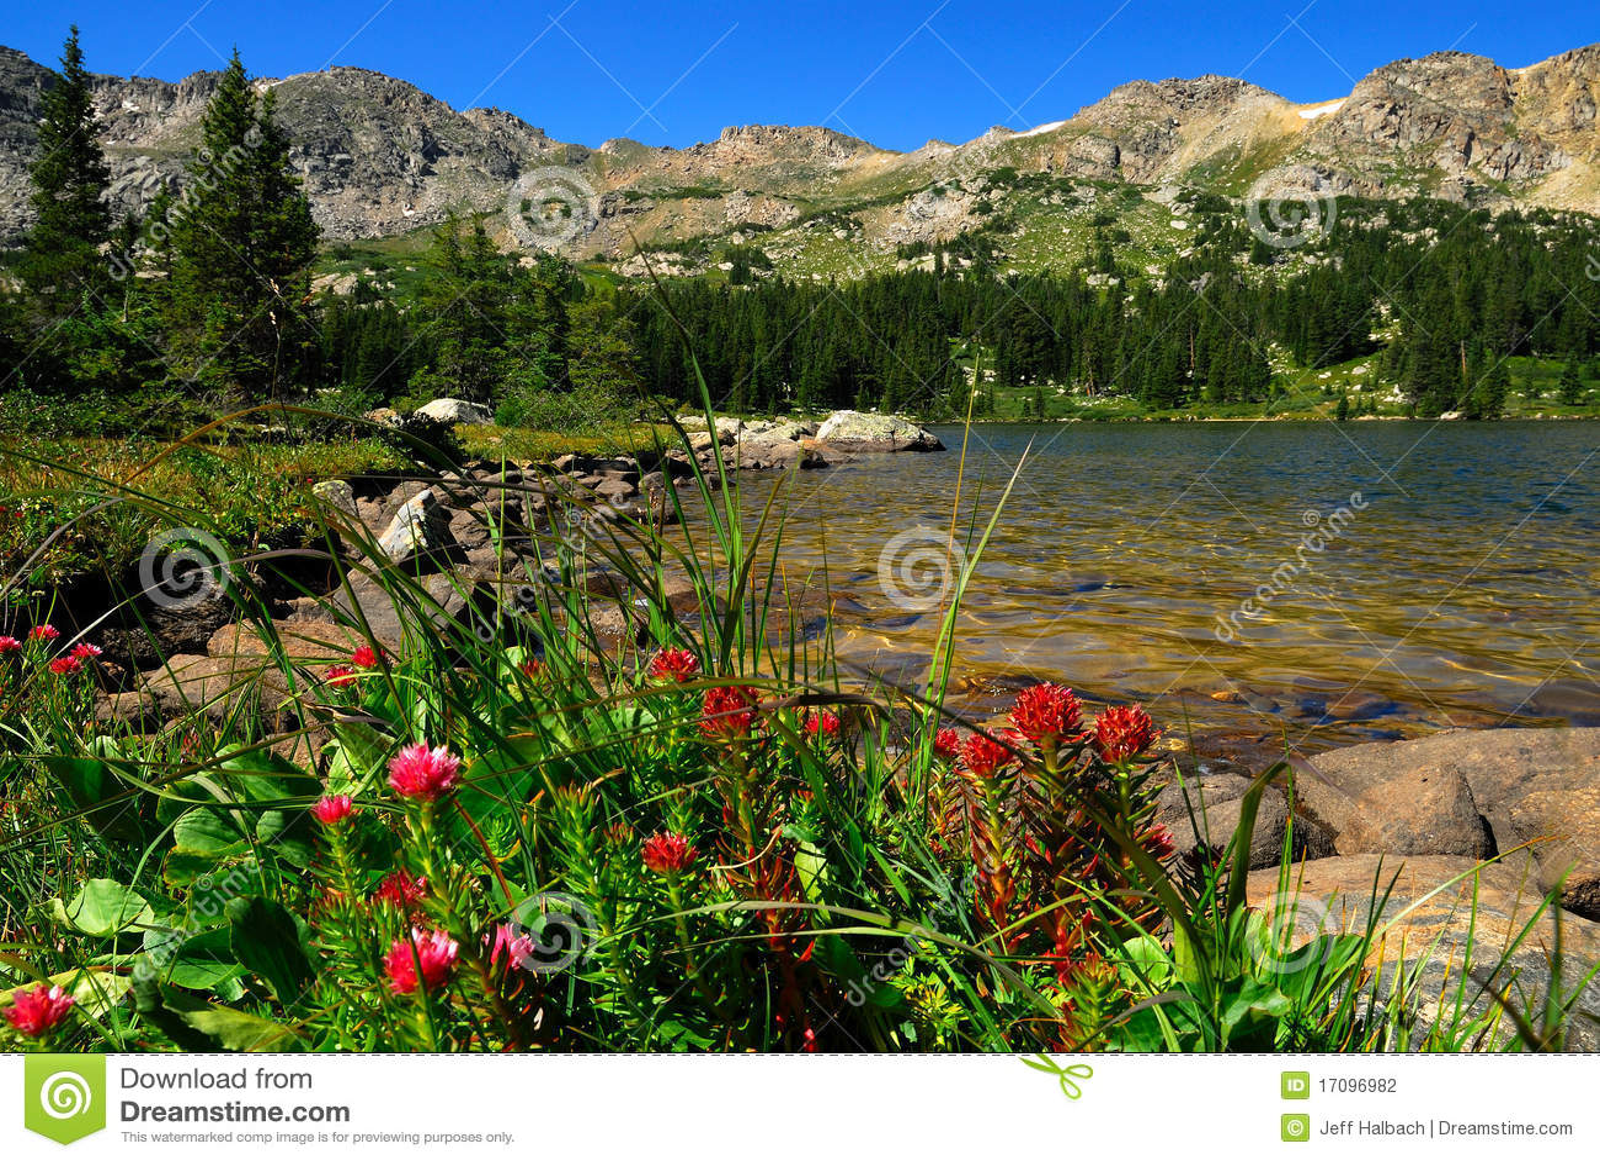 KoloradoWildflowers